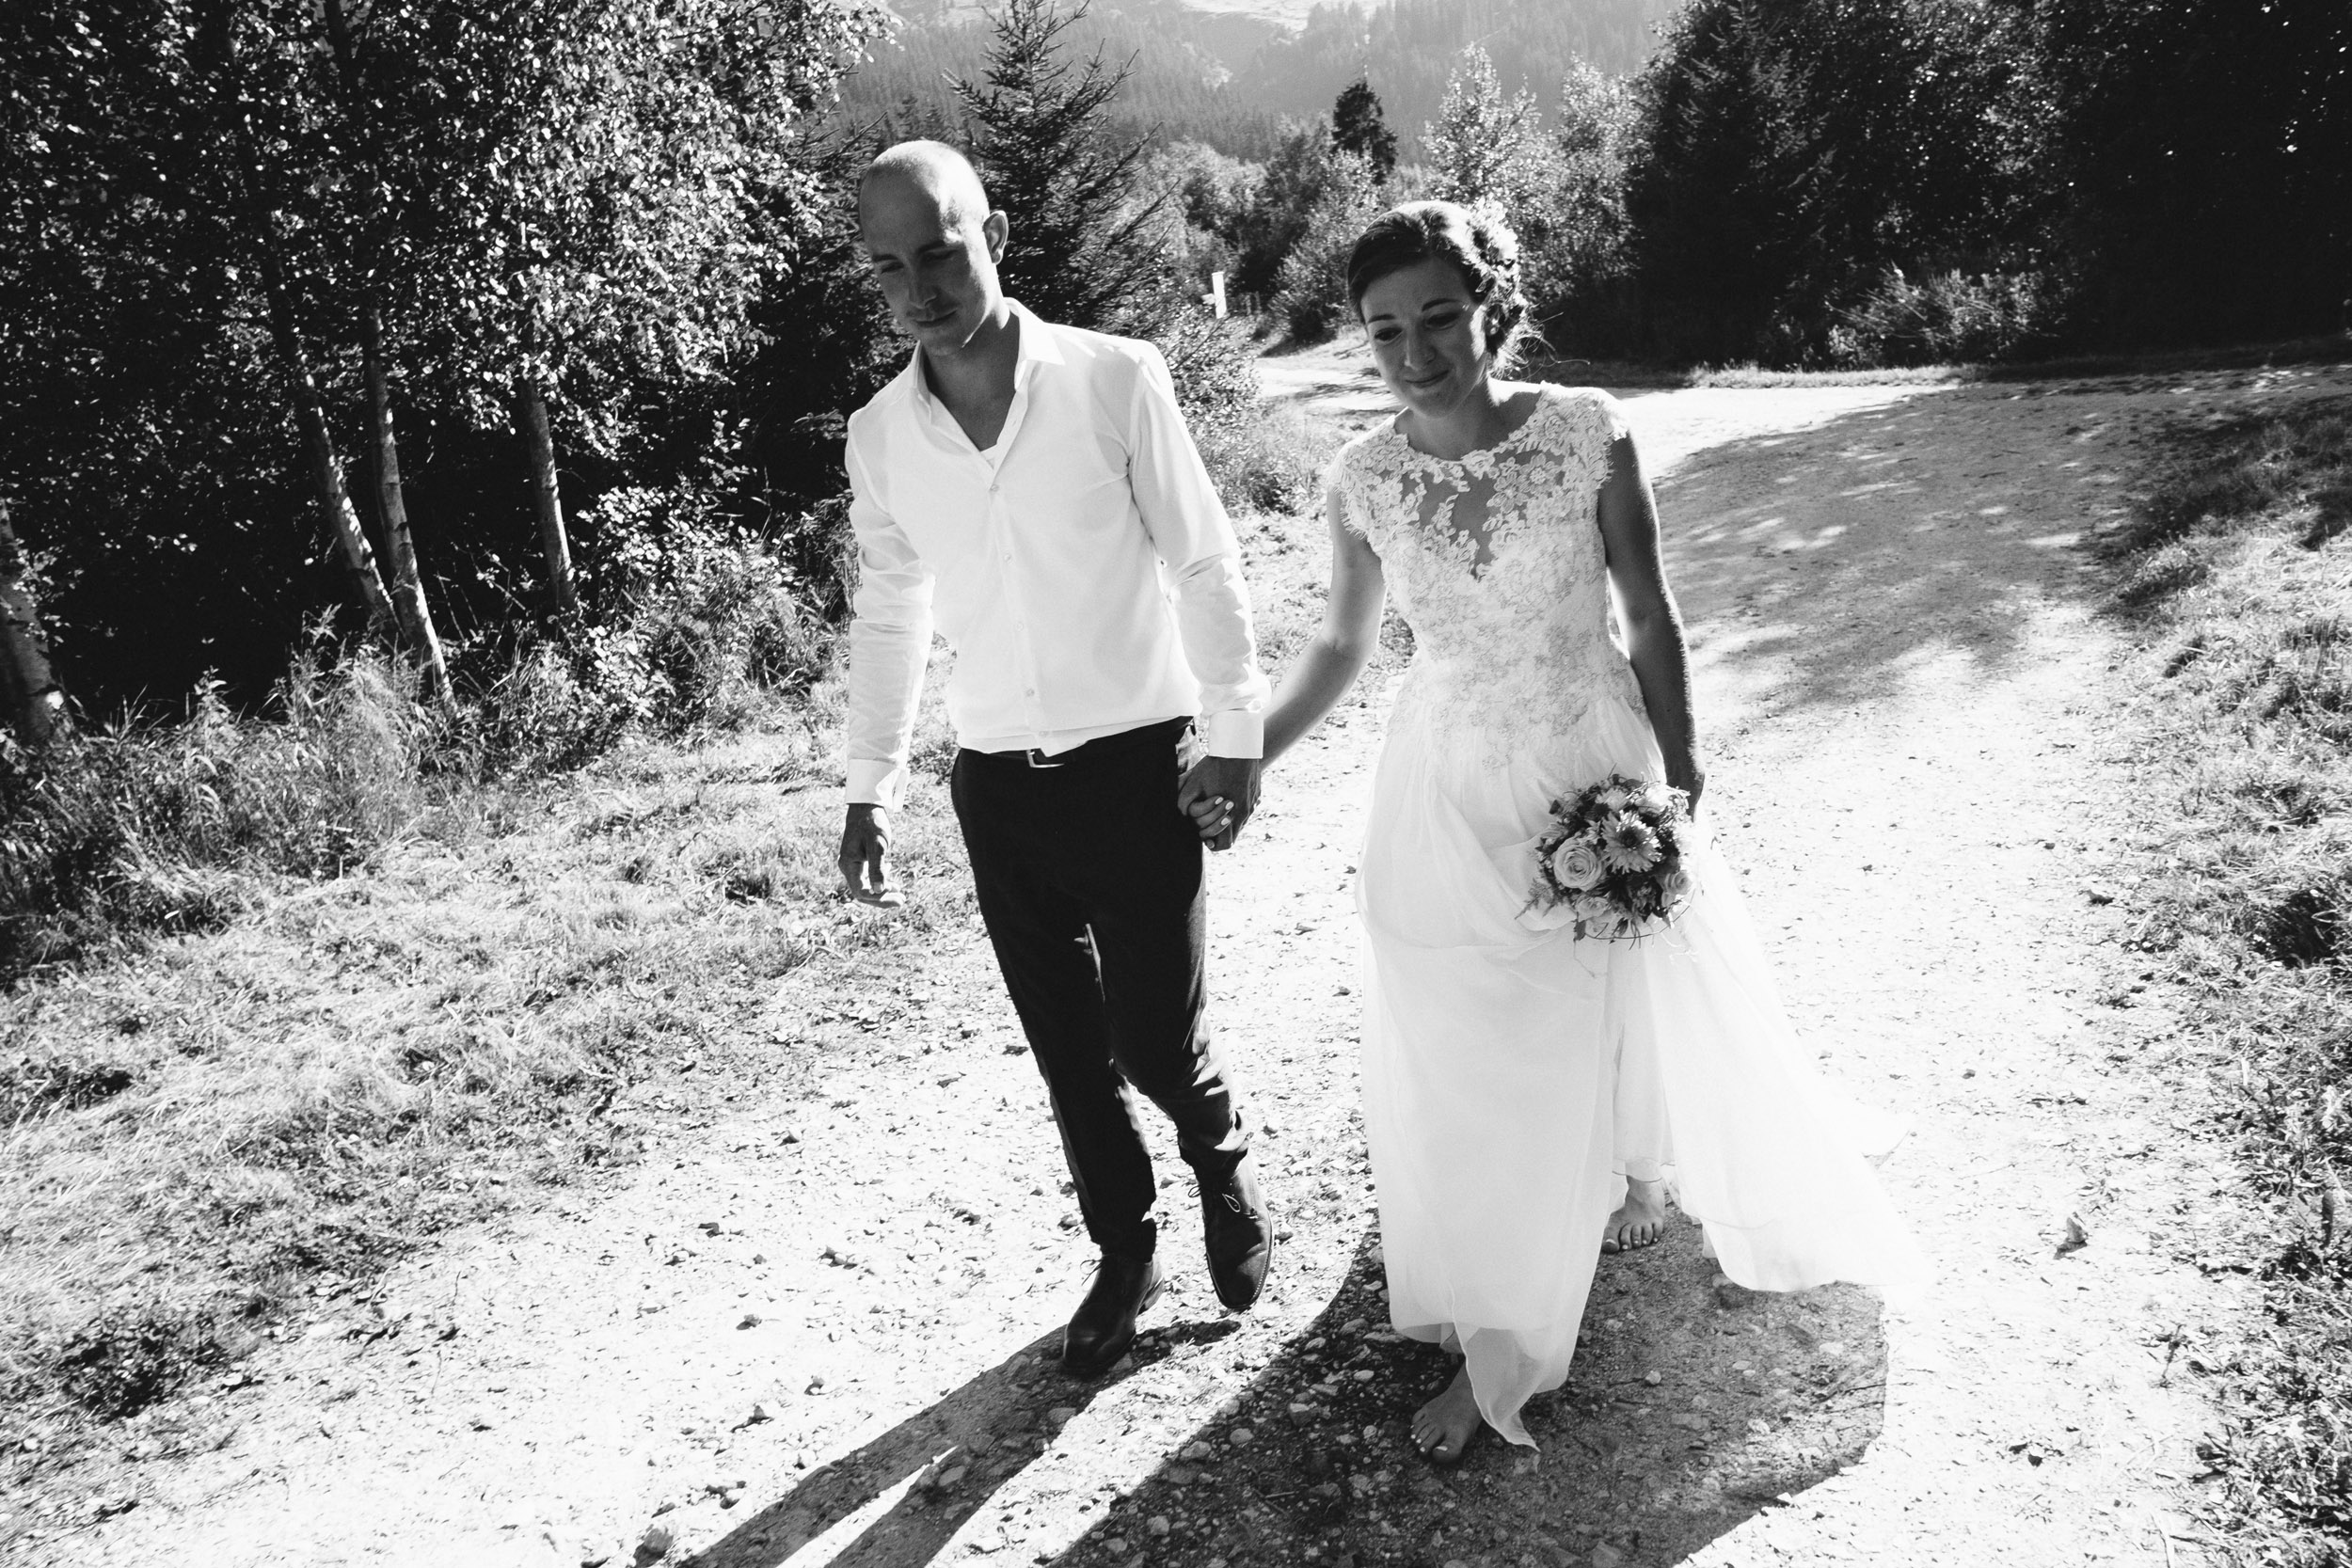 29-jim-parker-wedding-photos.jpg